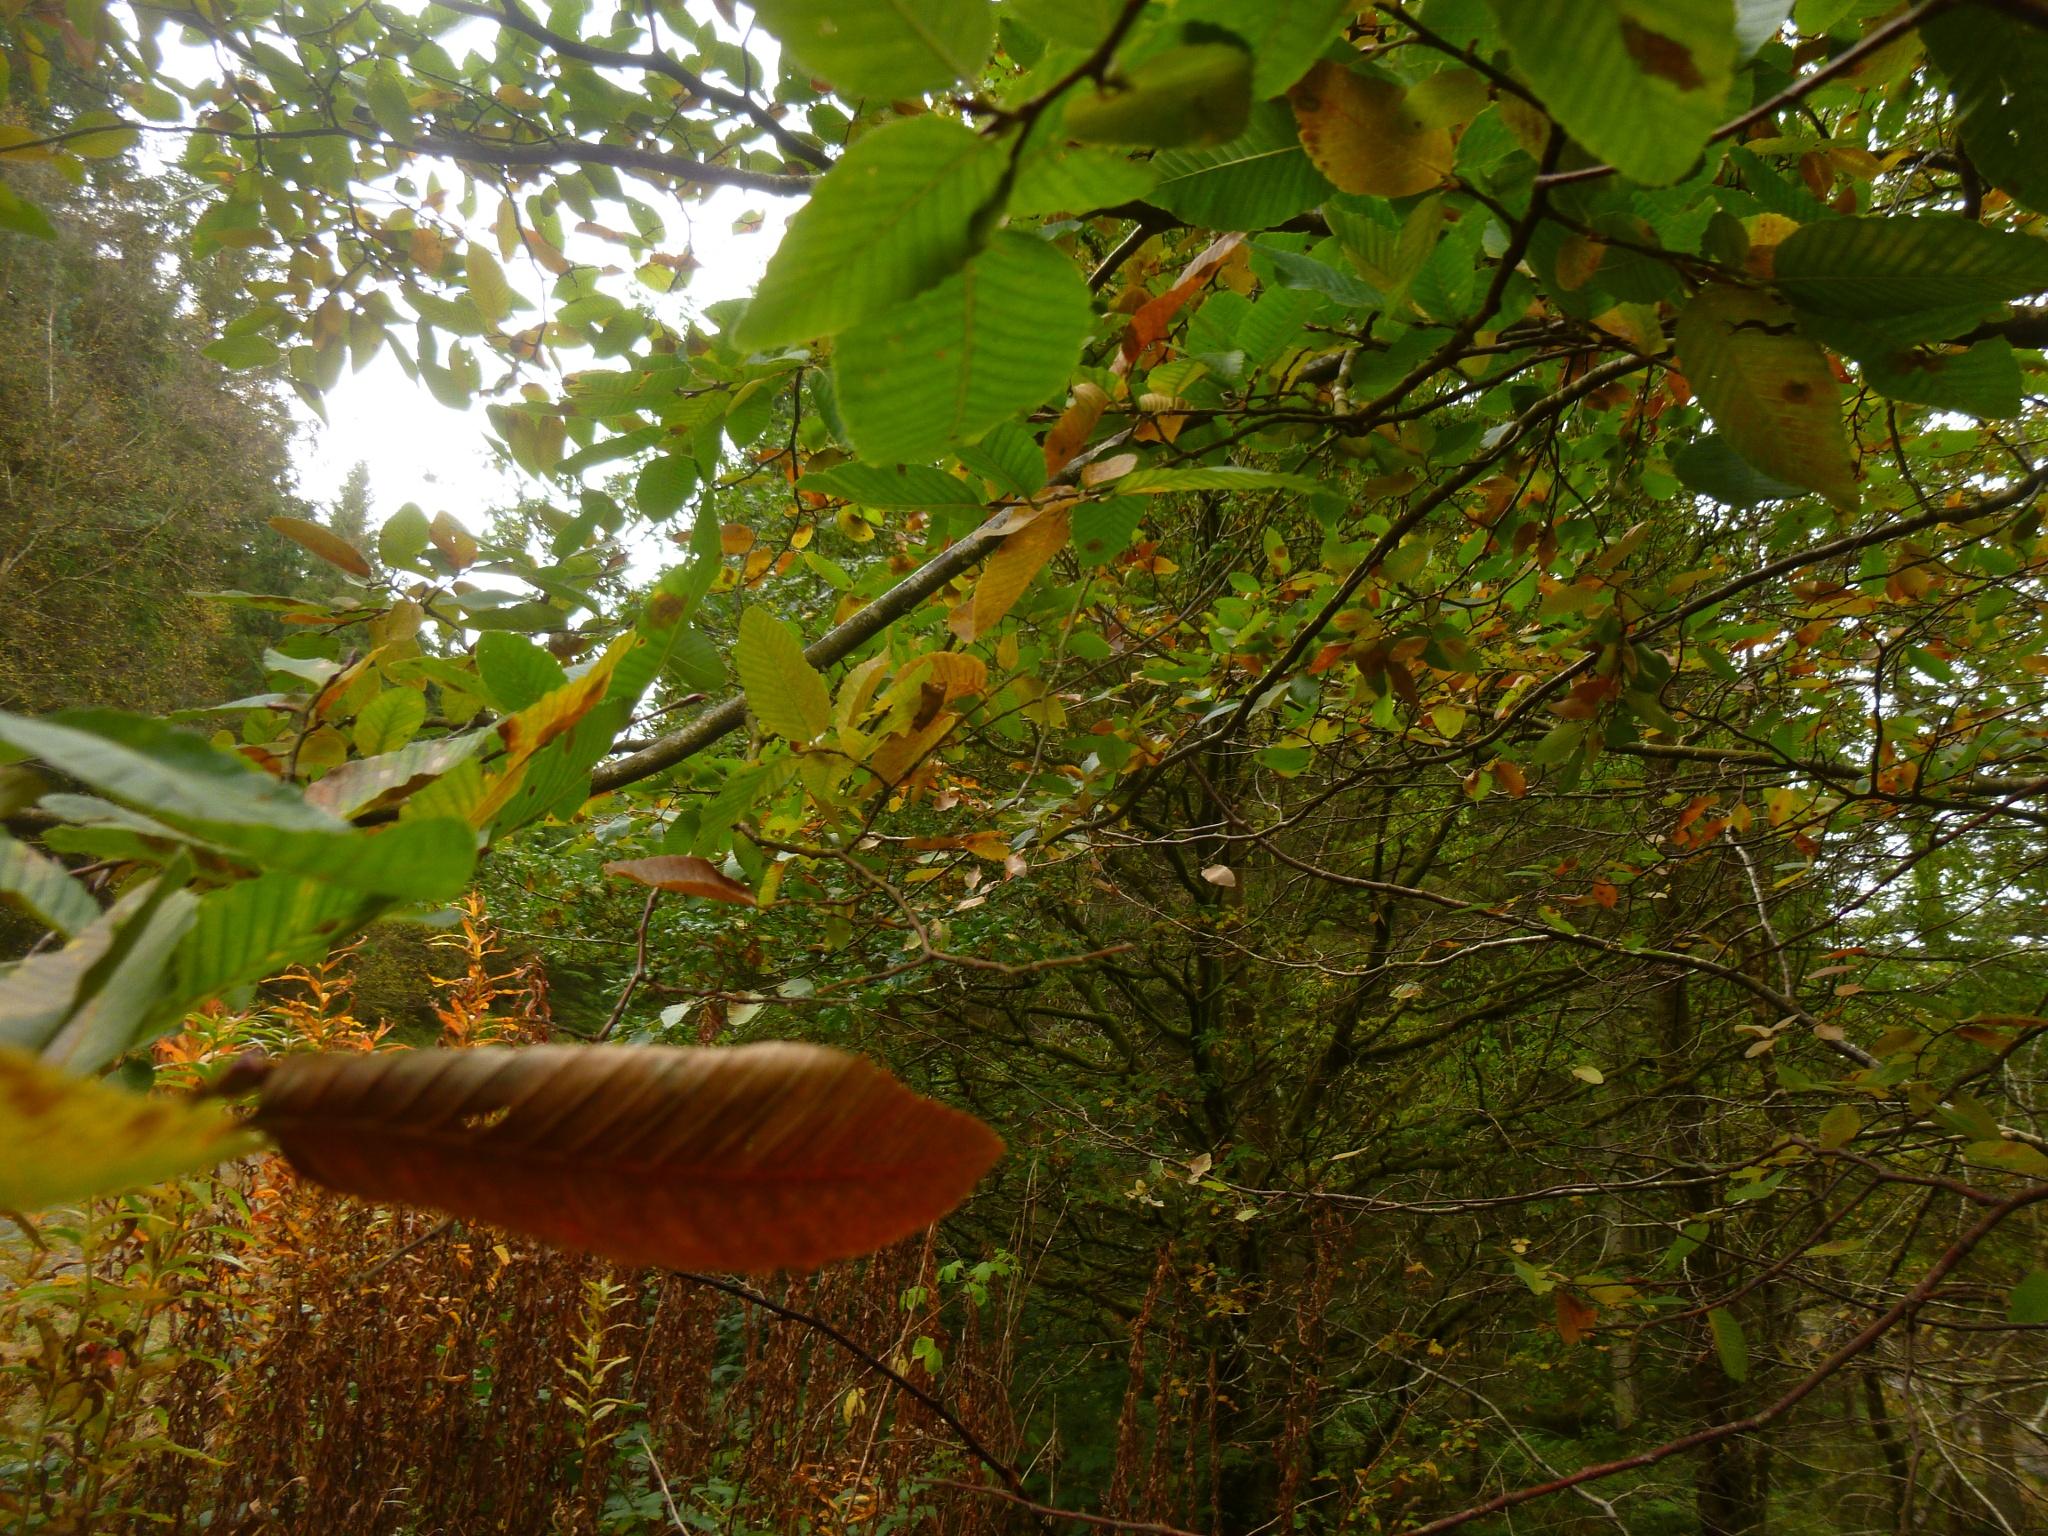 autumn woods by chris.adams.3557